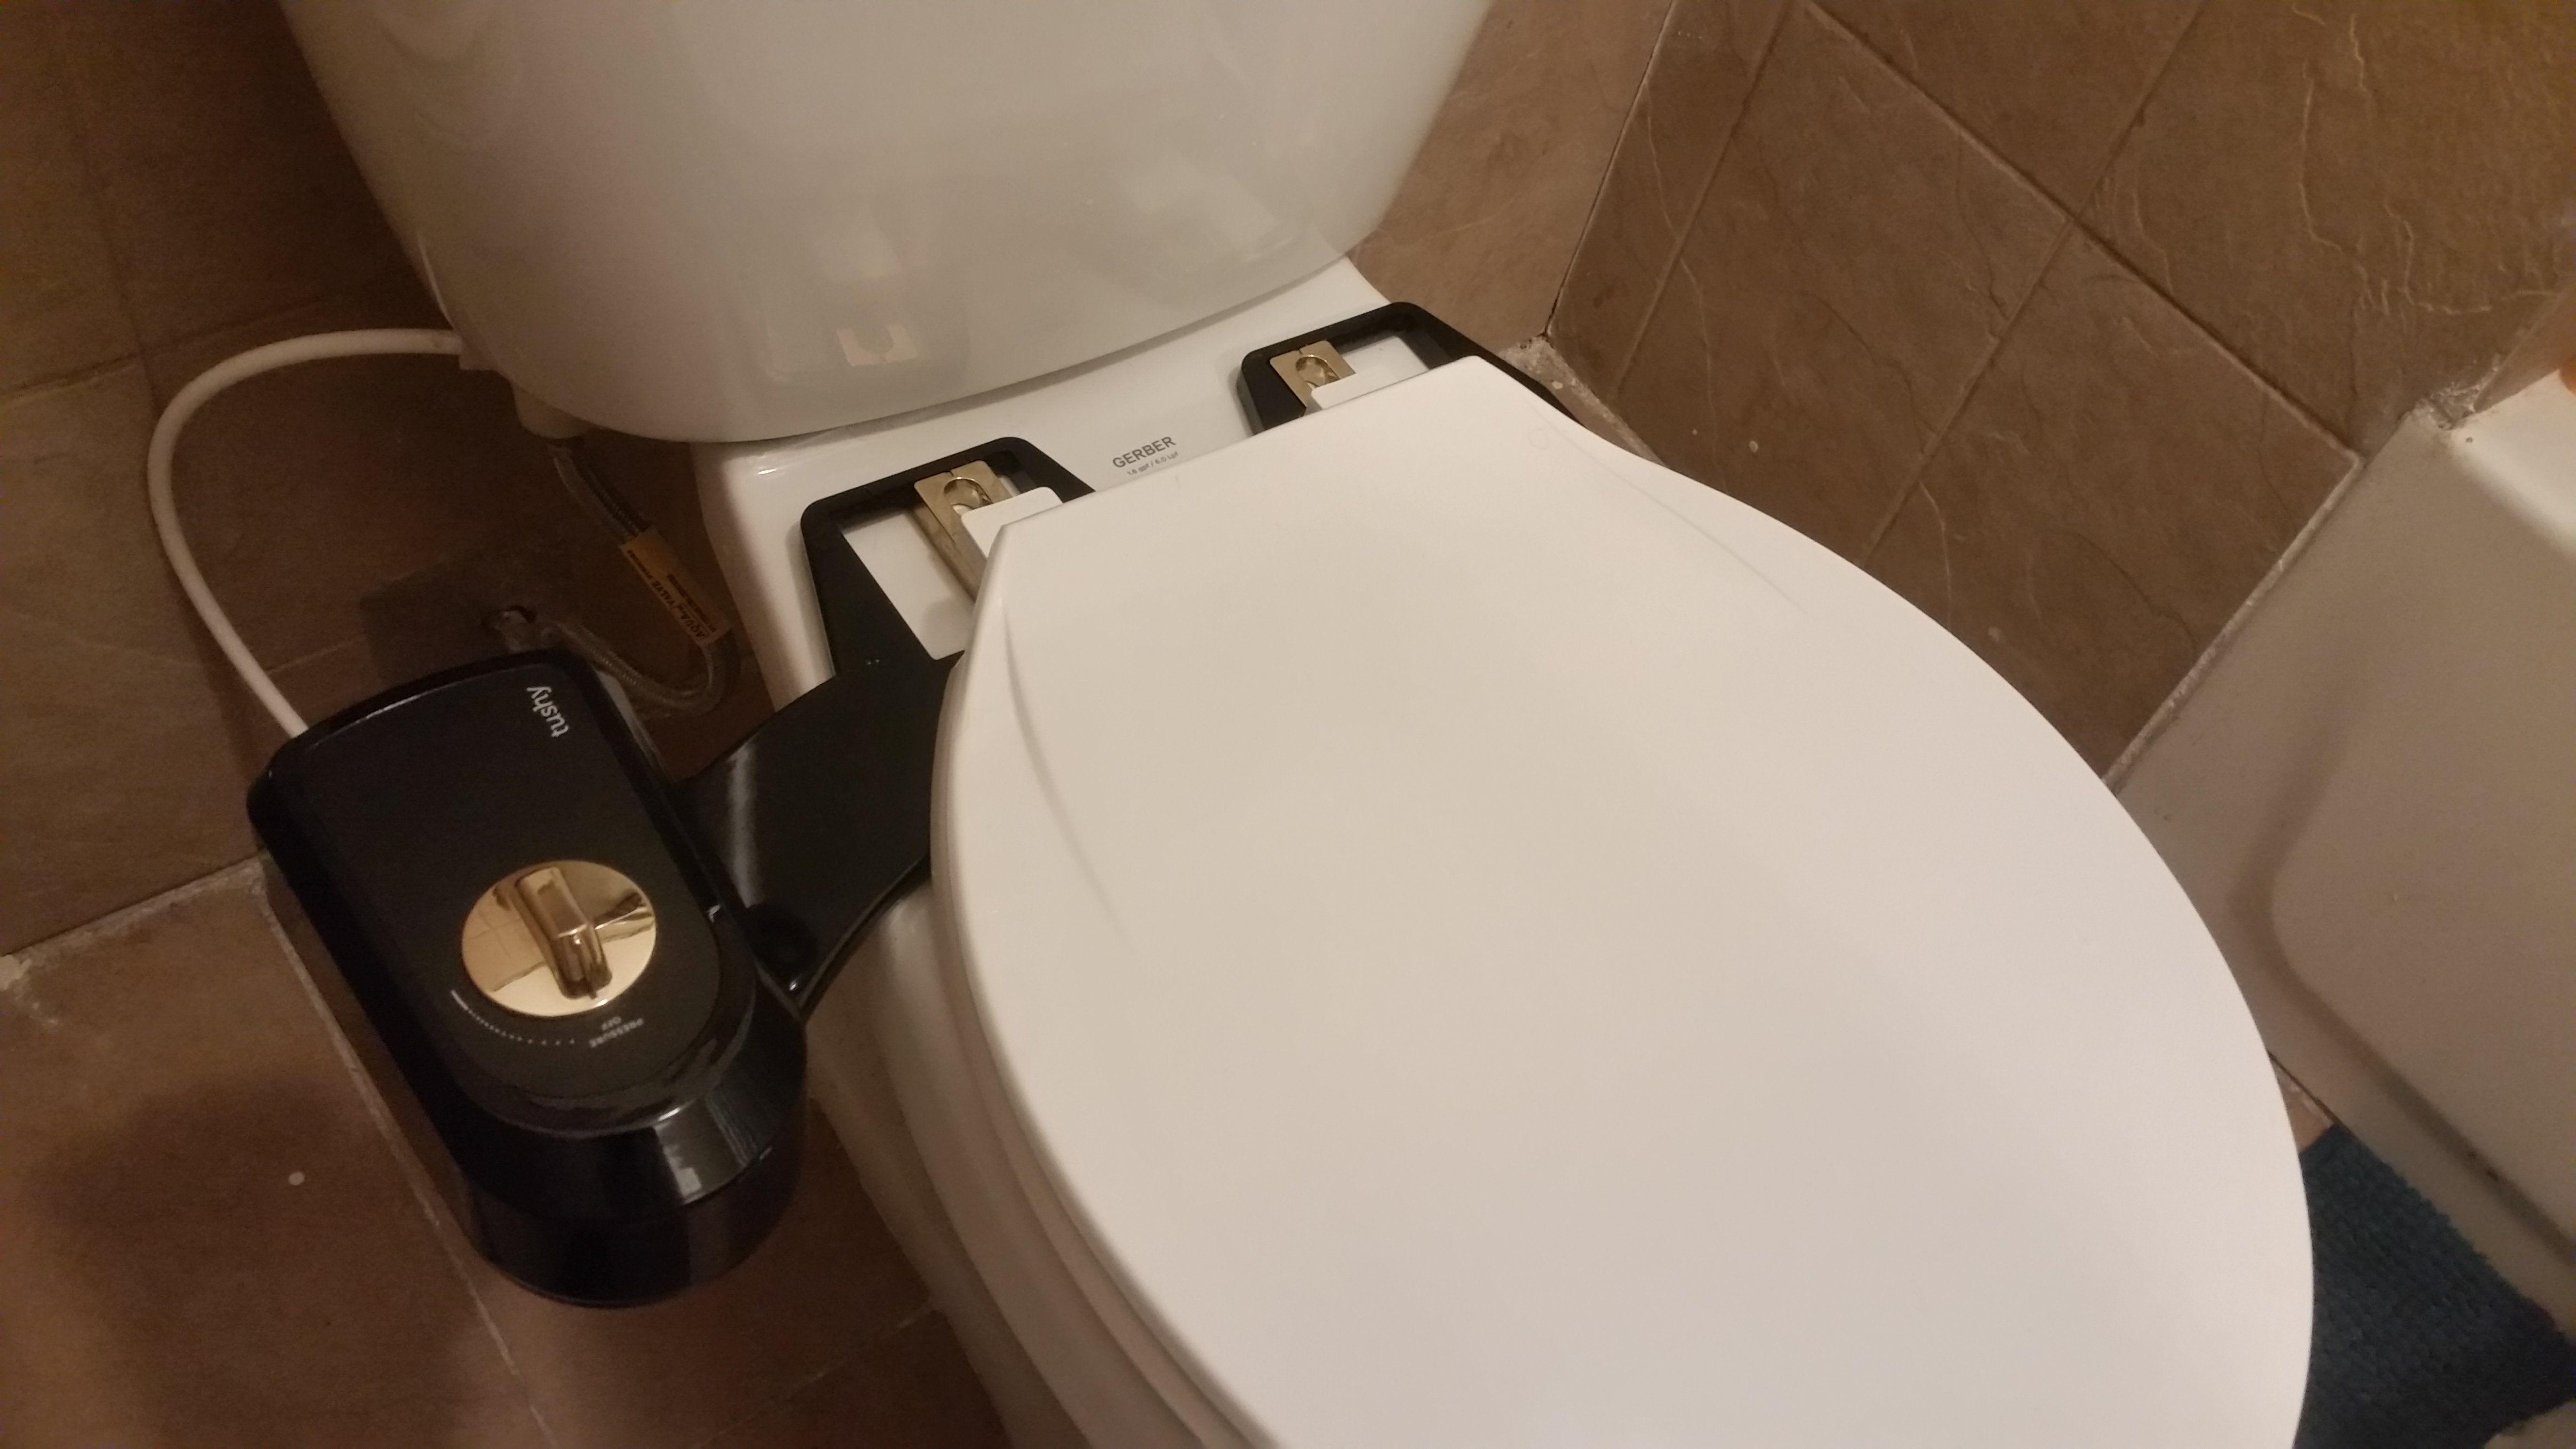 Toilet cunt lips